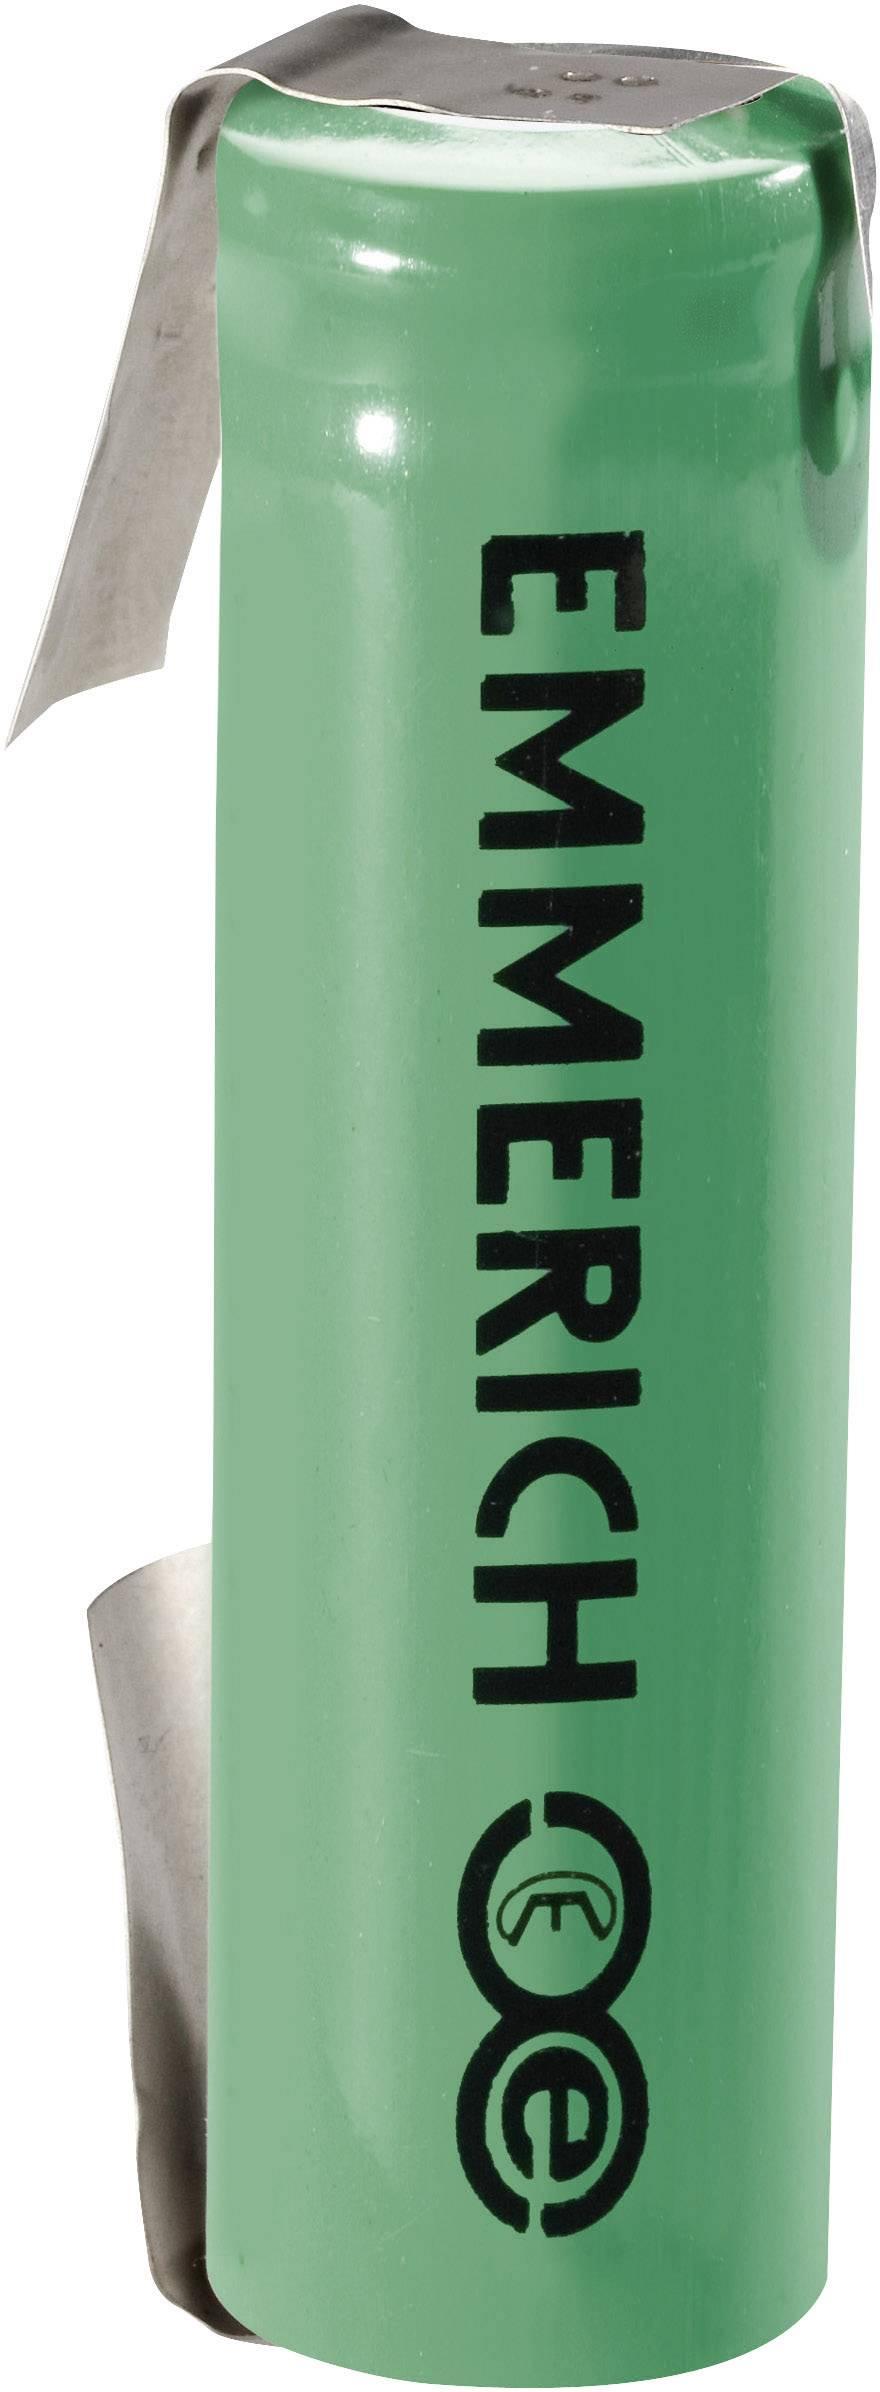 Akumulátor Emmerich Li-Ion-Mn,ULF 3,7 V 1500 mAh